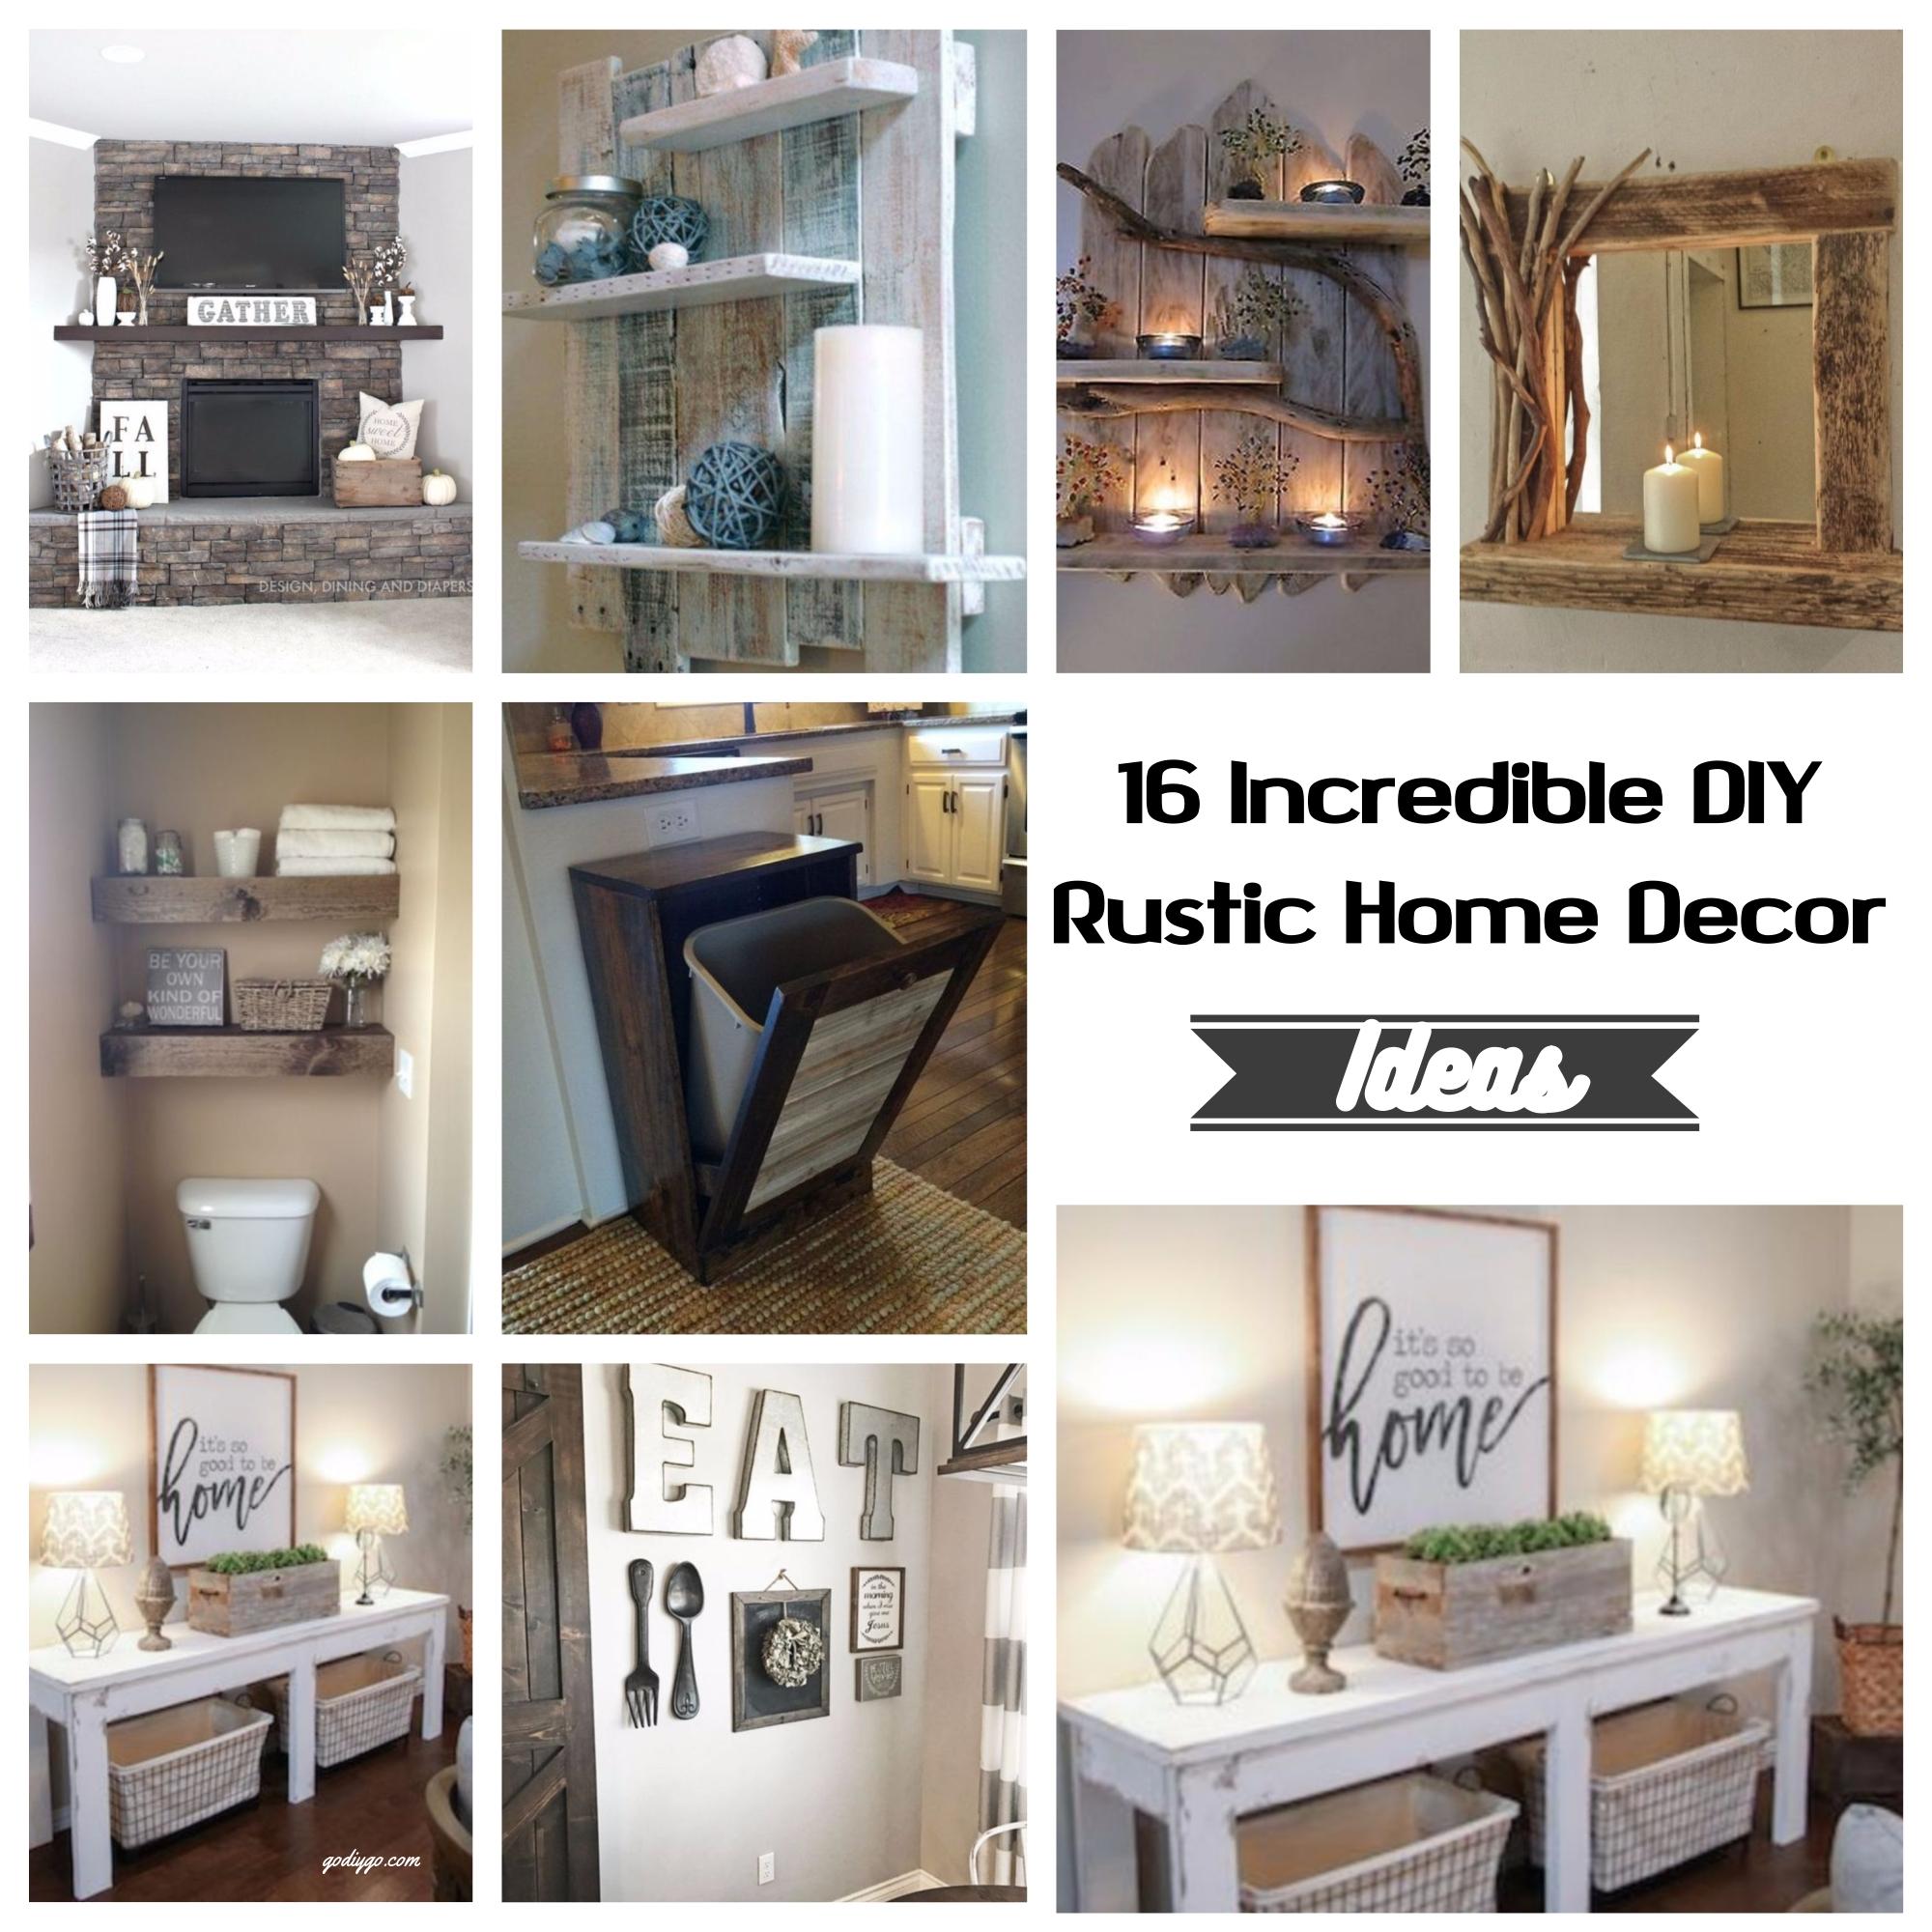 16 Incredible Diy Rustic Home Decor Ideas Godiygo Com